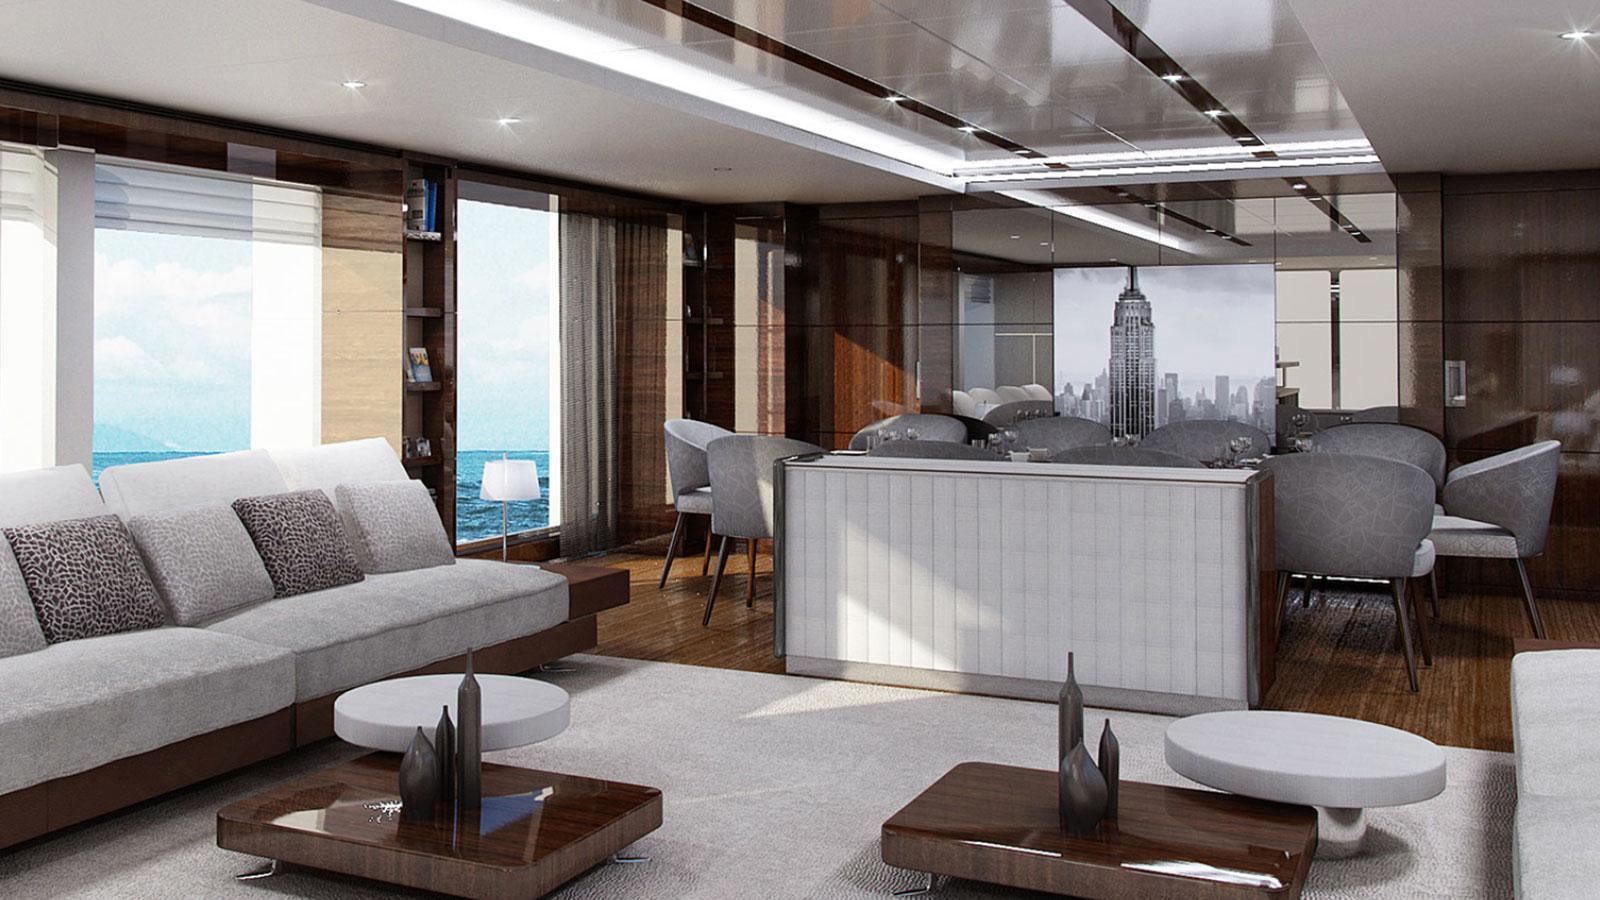 Benetti Supreme 132 motoryacht Benetti 40m 2020 saloon sistership